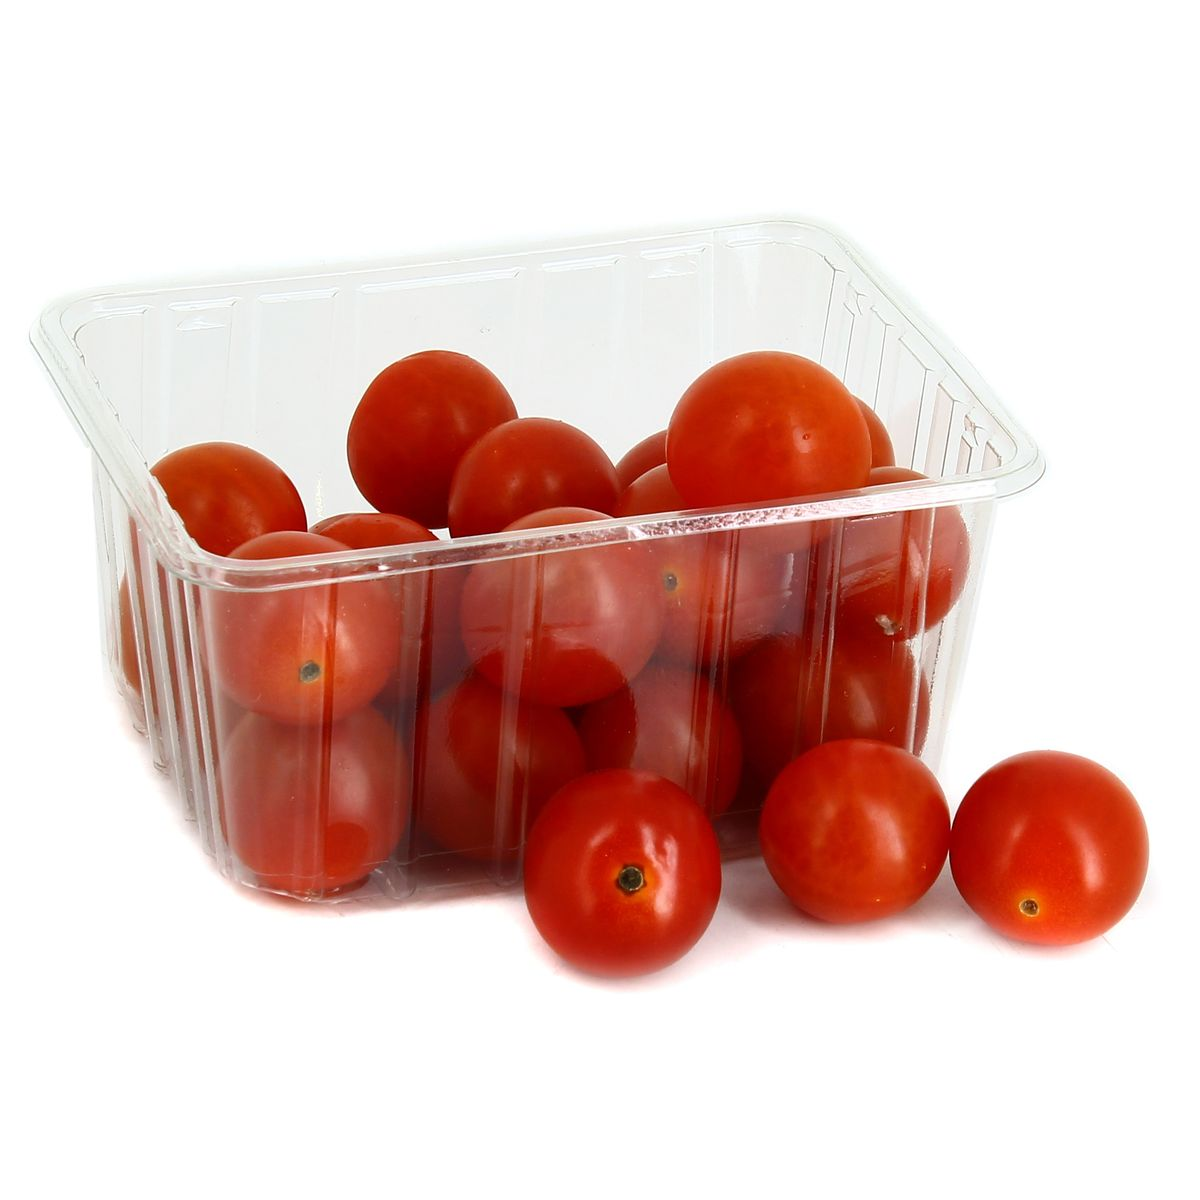 Barquette de tomates cerise ronde It. BIO (250 g)